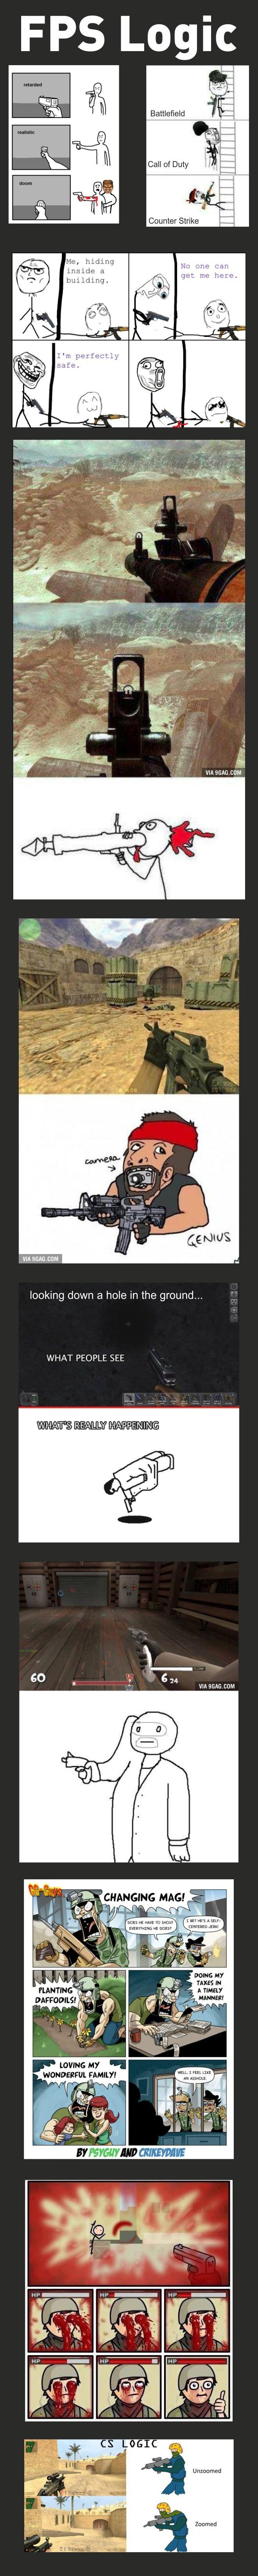 FPS Logic...